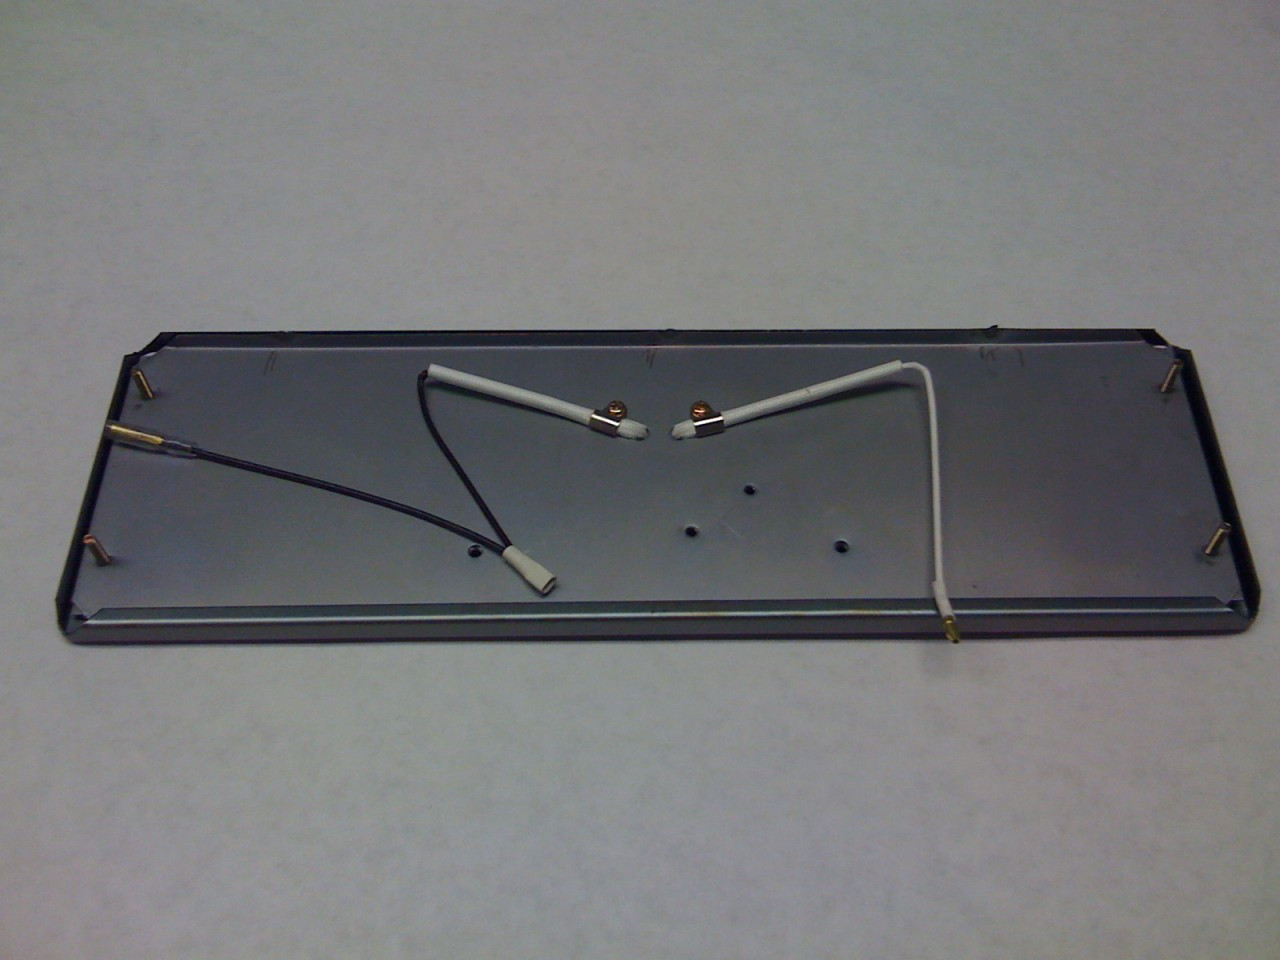 TorRey TS-450,TS-500,TW-500 - Hot Plate - 06-55100